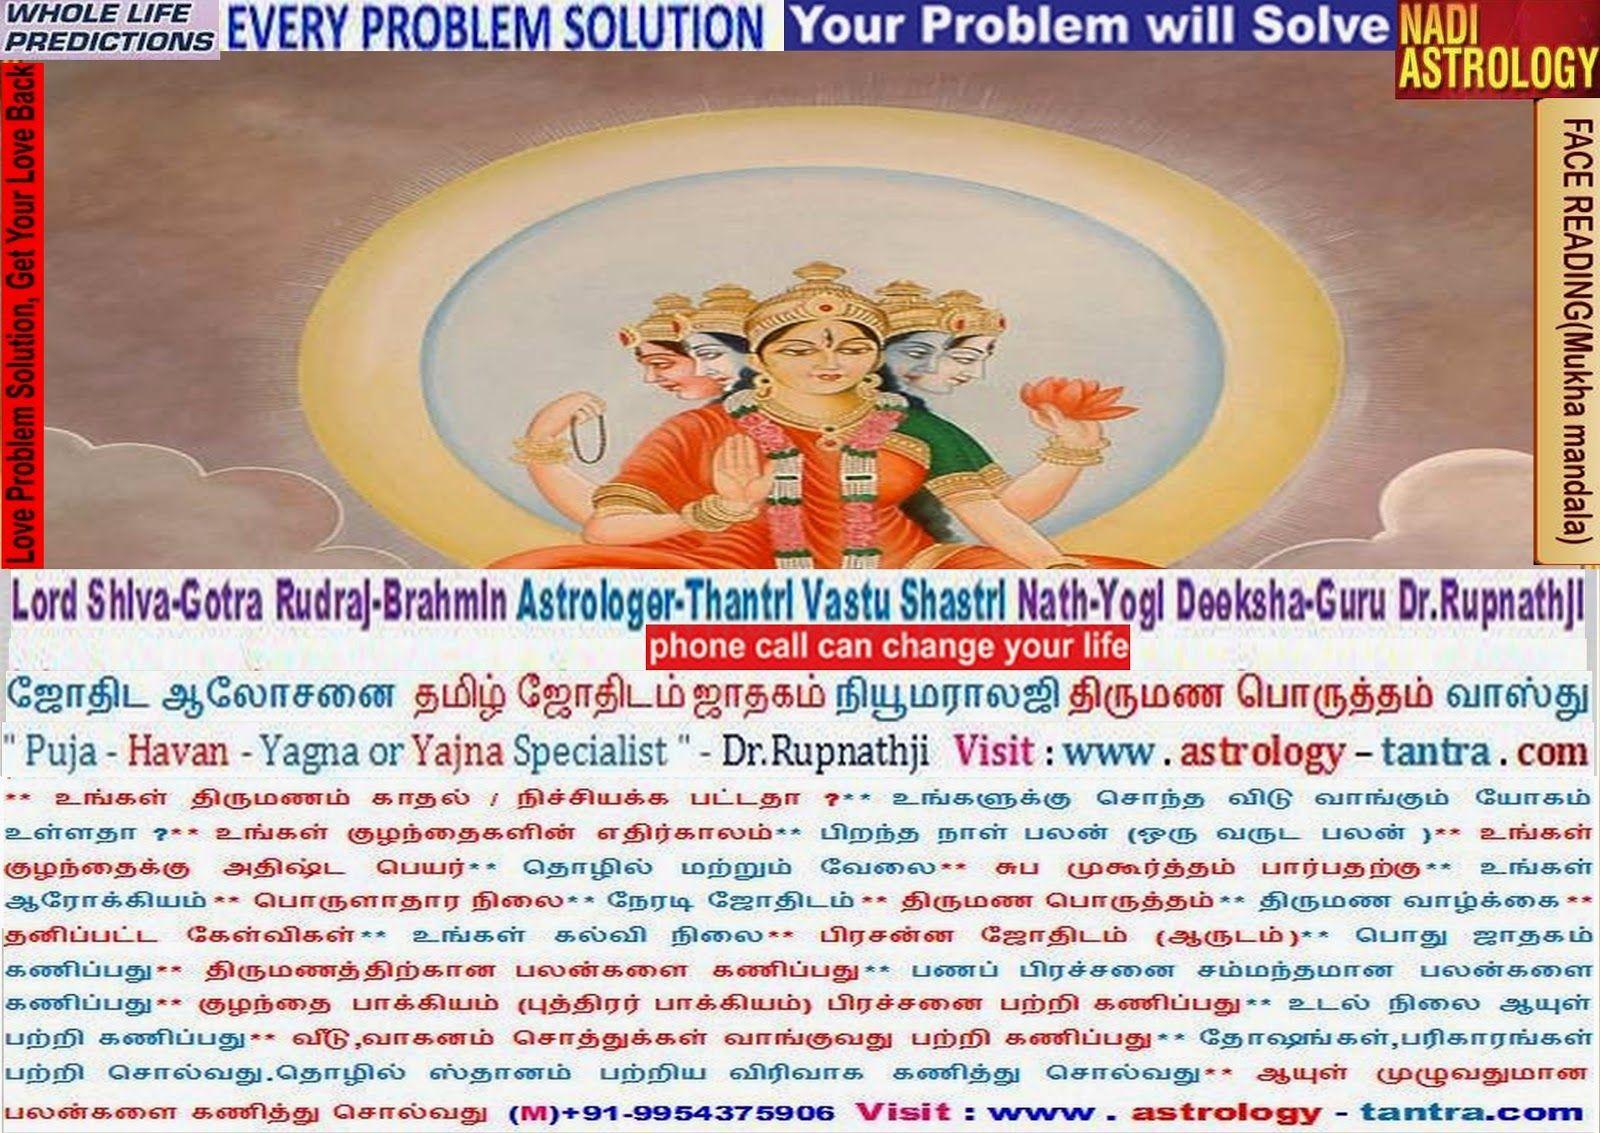 Ariyalur Chennai Coimbatore Cuddalore Dharmapuri Jyotish Astrologer